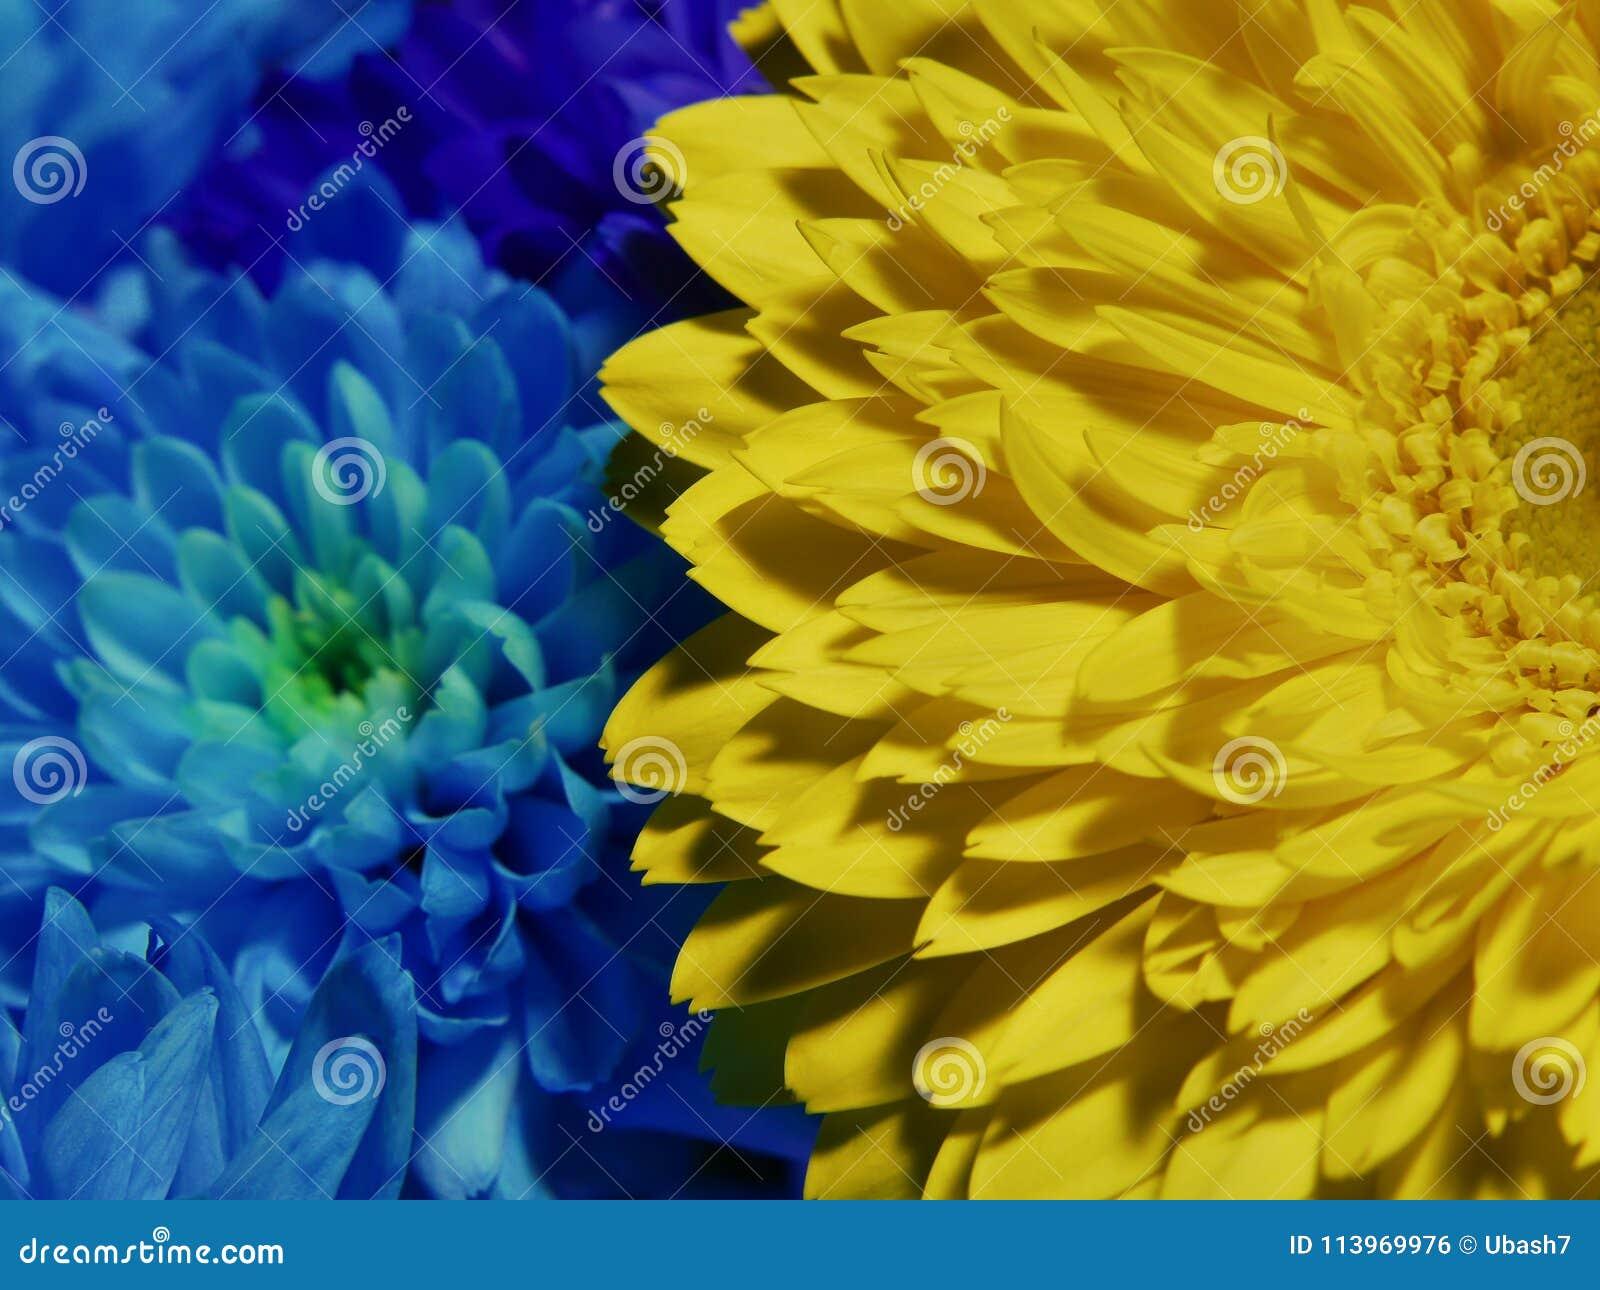 Macro Of Yellow And Blue Flowers Gerbera Near Chrysanthemum Stock